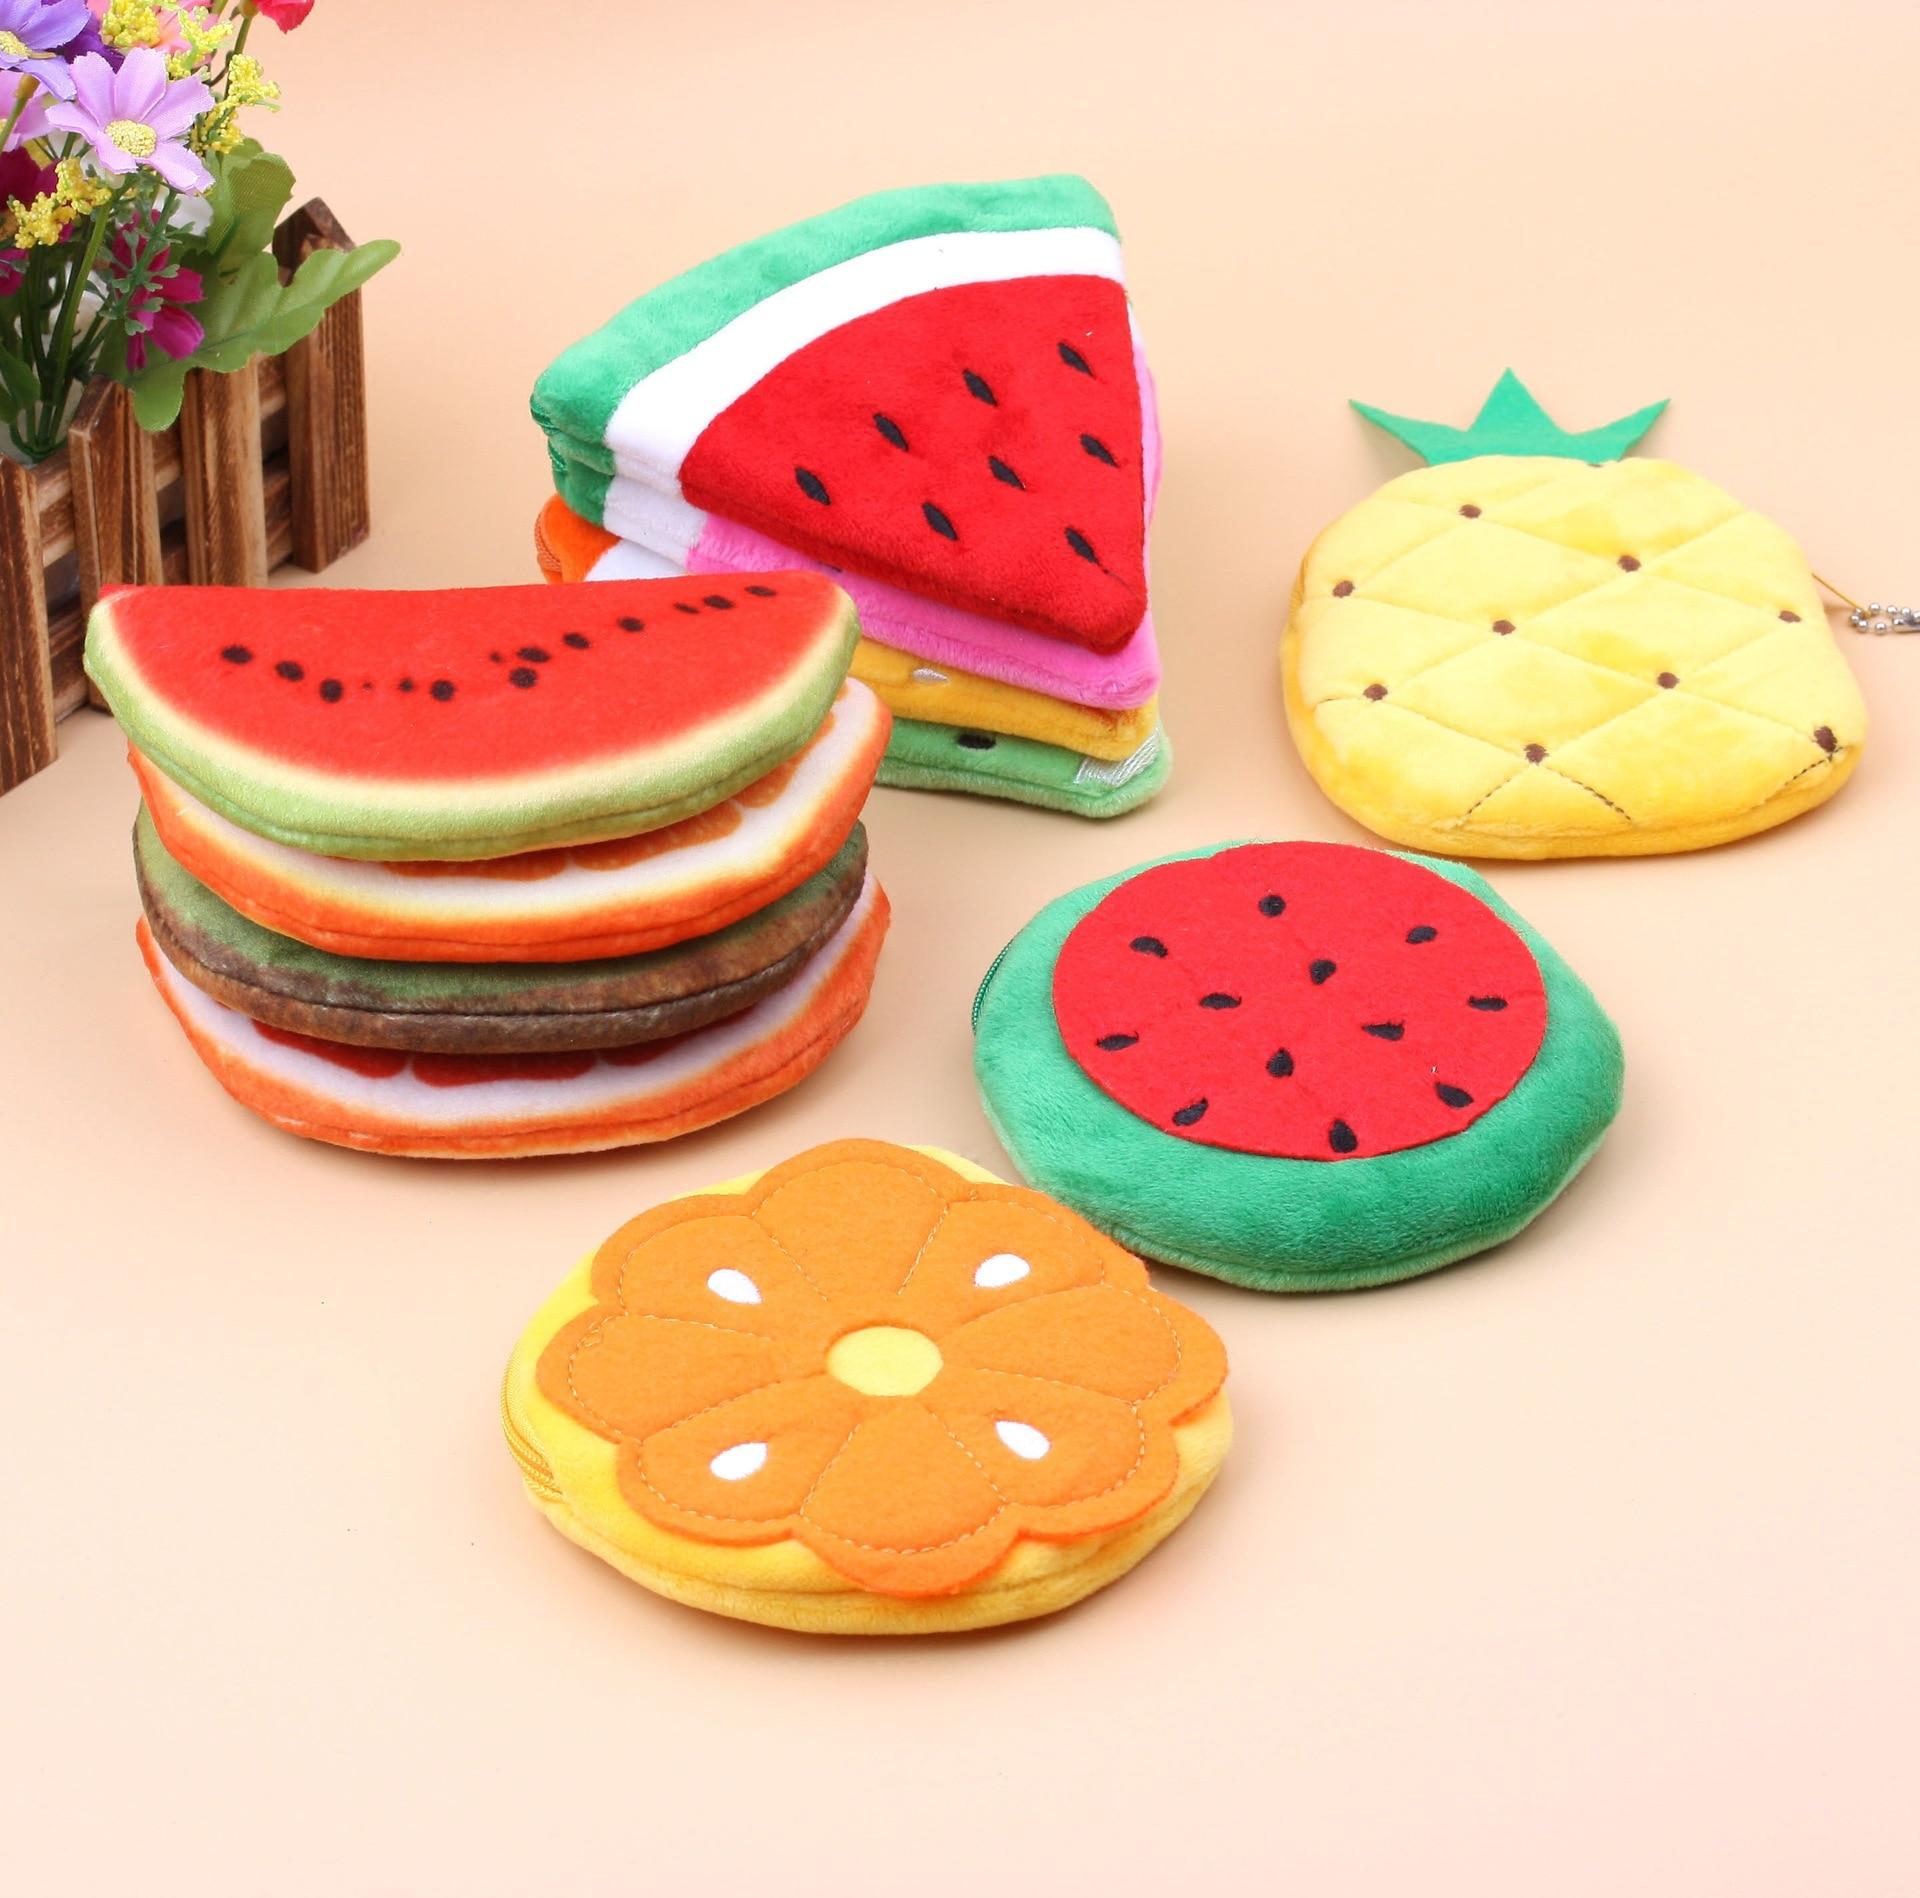 Fruits Shape Orange Strawberry Watermelon Plush Purses Plush Toys Children Girls Pocket Purse Keychain For New Year Gifts